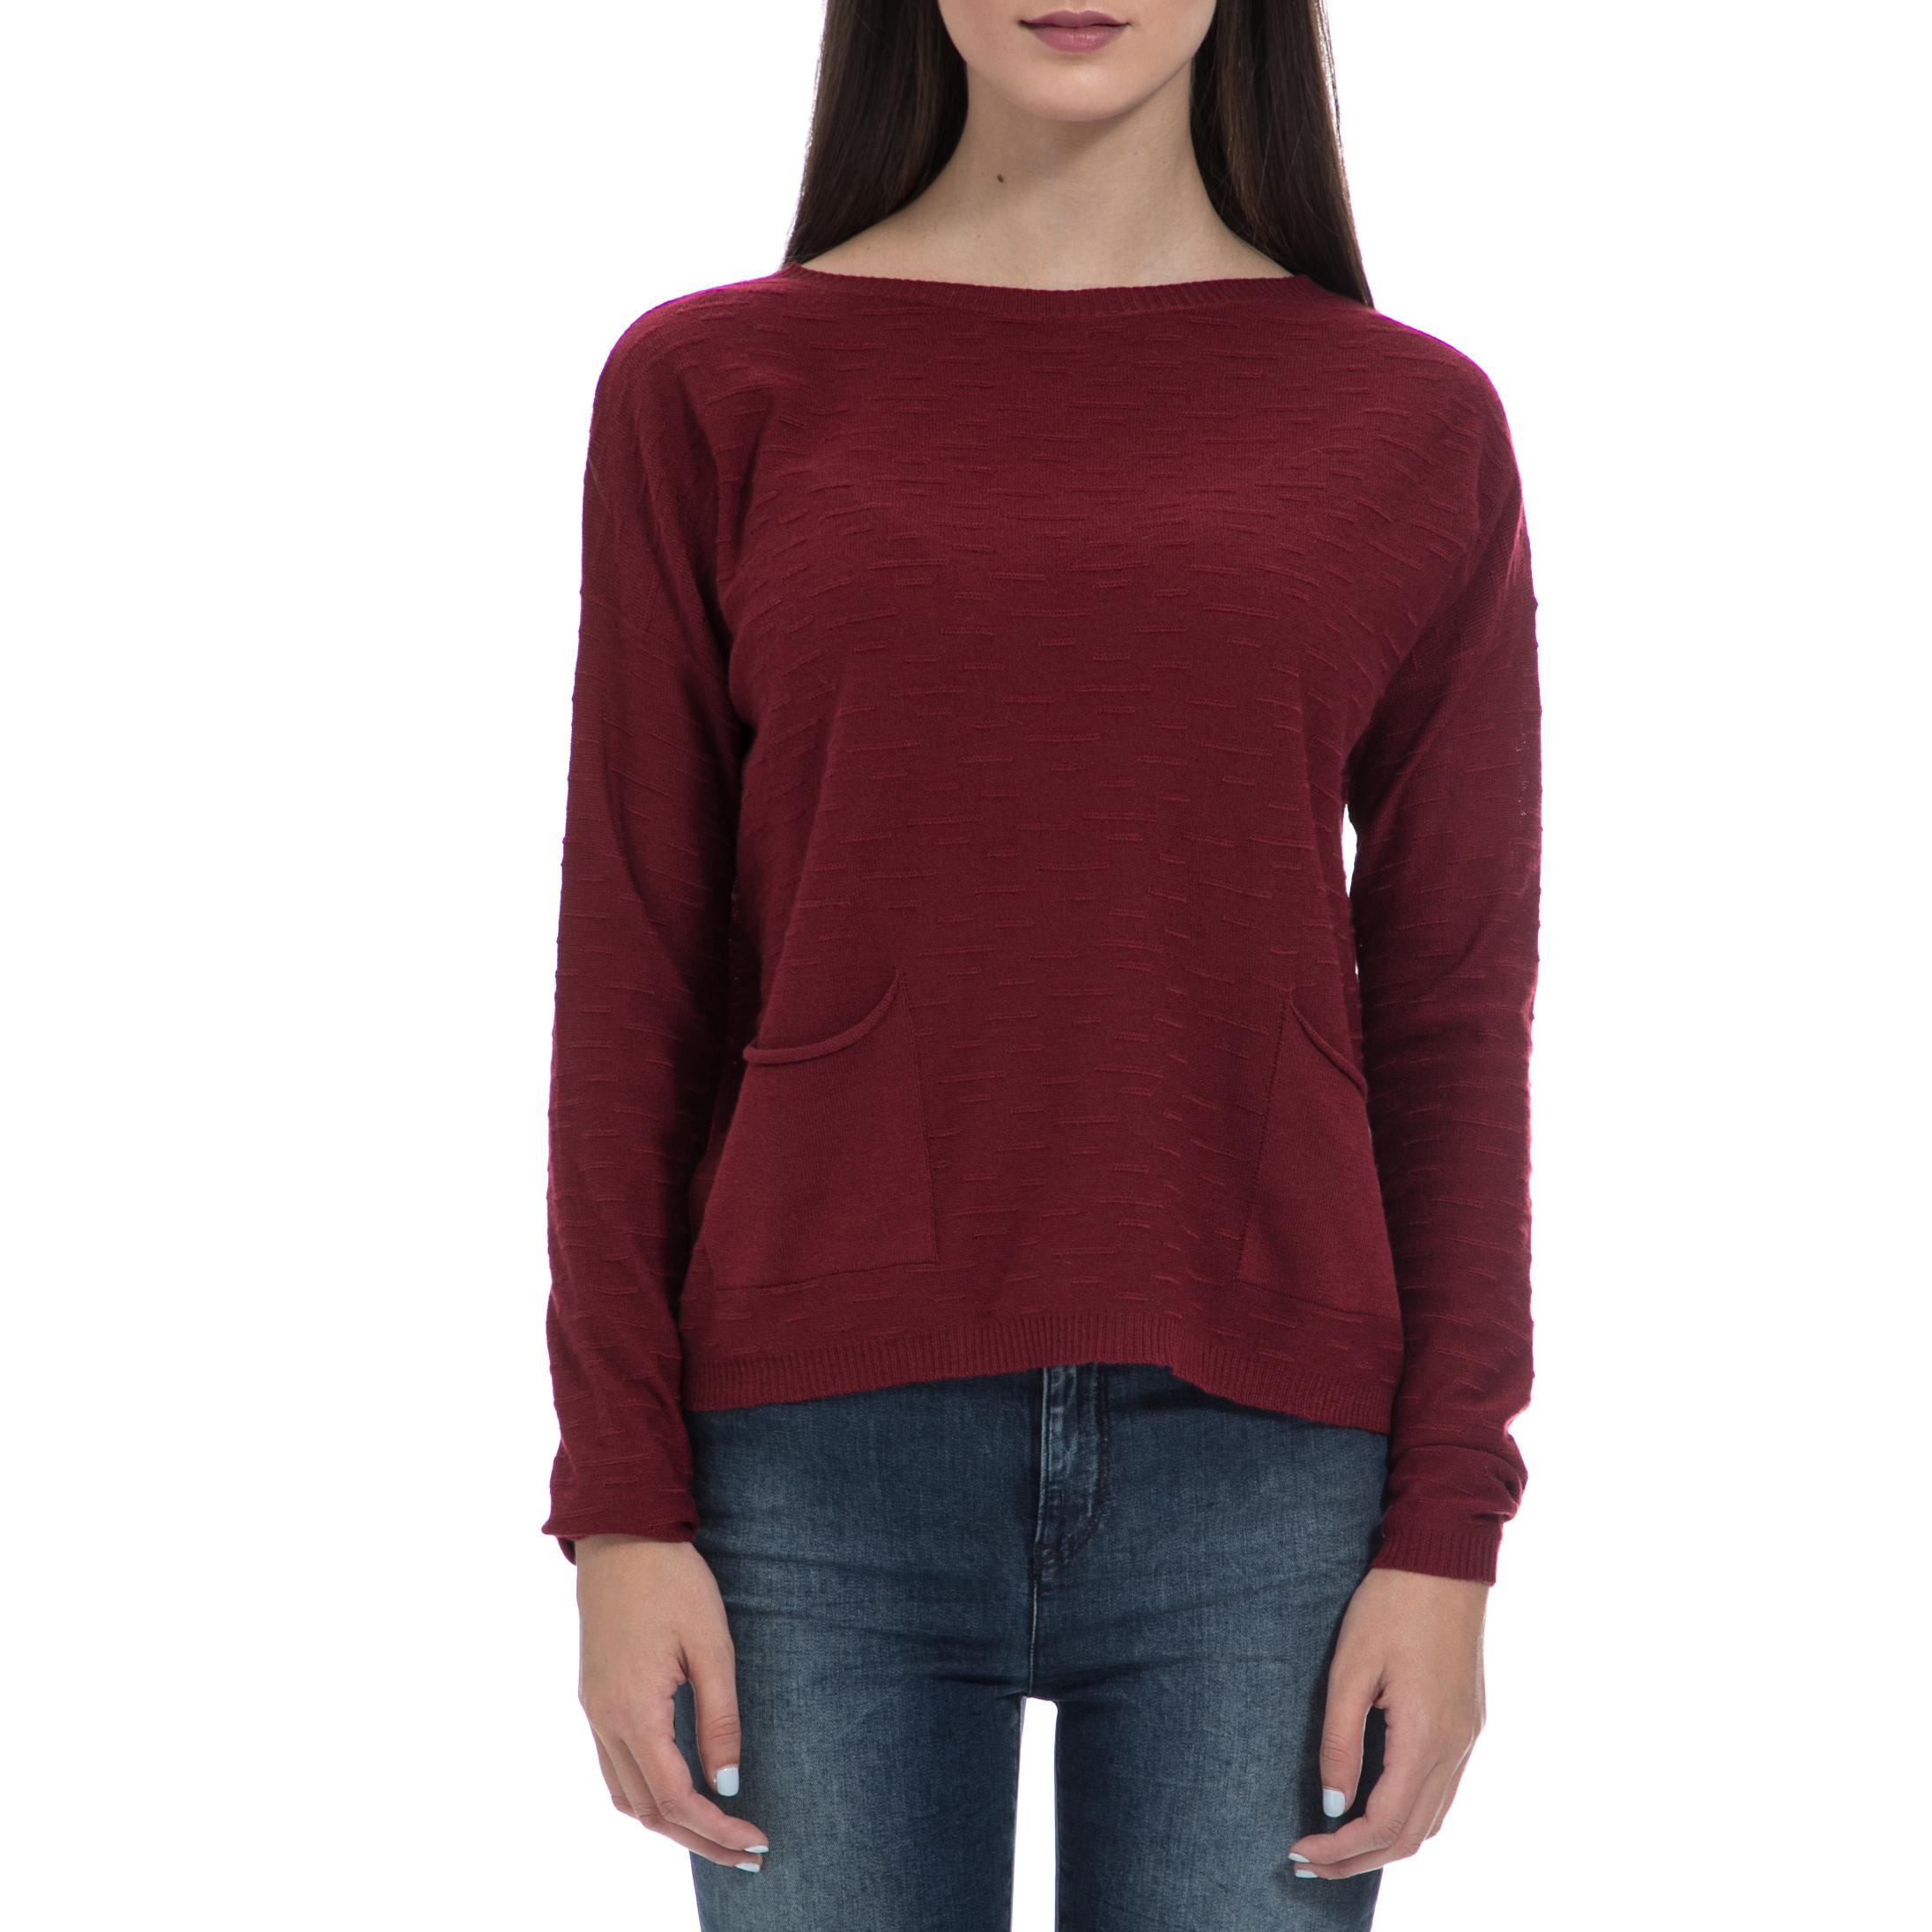 GAS - Γυναικεία μπλούζα GAS μπορντό γυναικεία ρούχα πλεκτά ζακέτες πουλόβερ